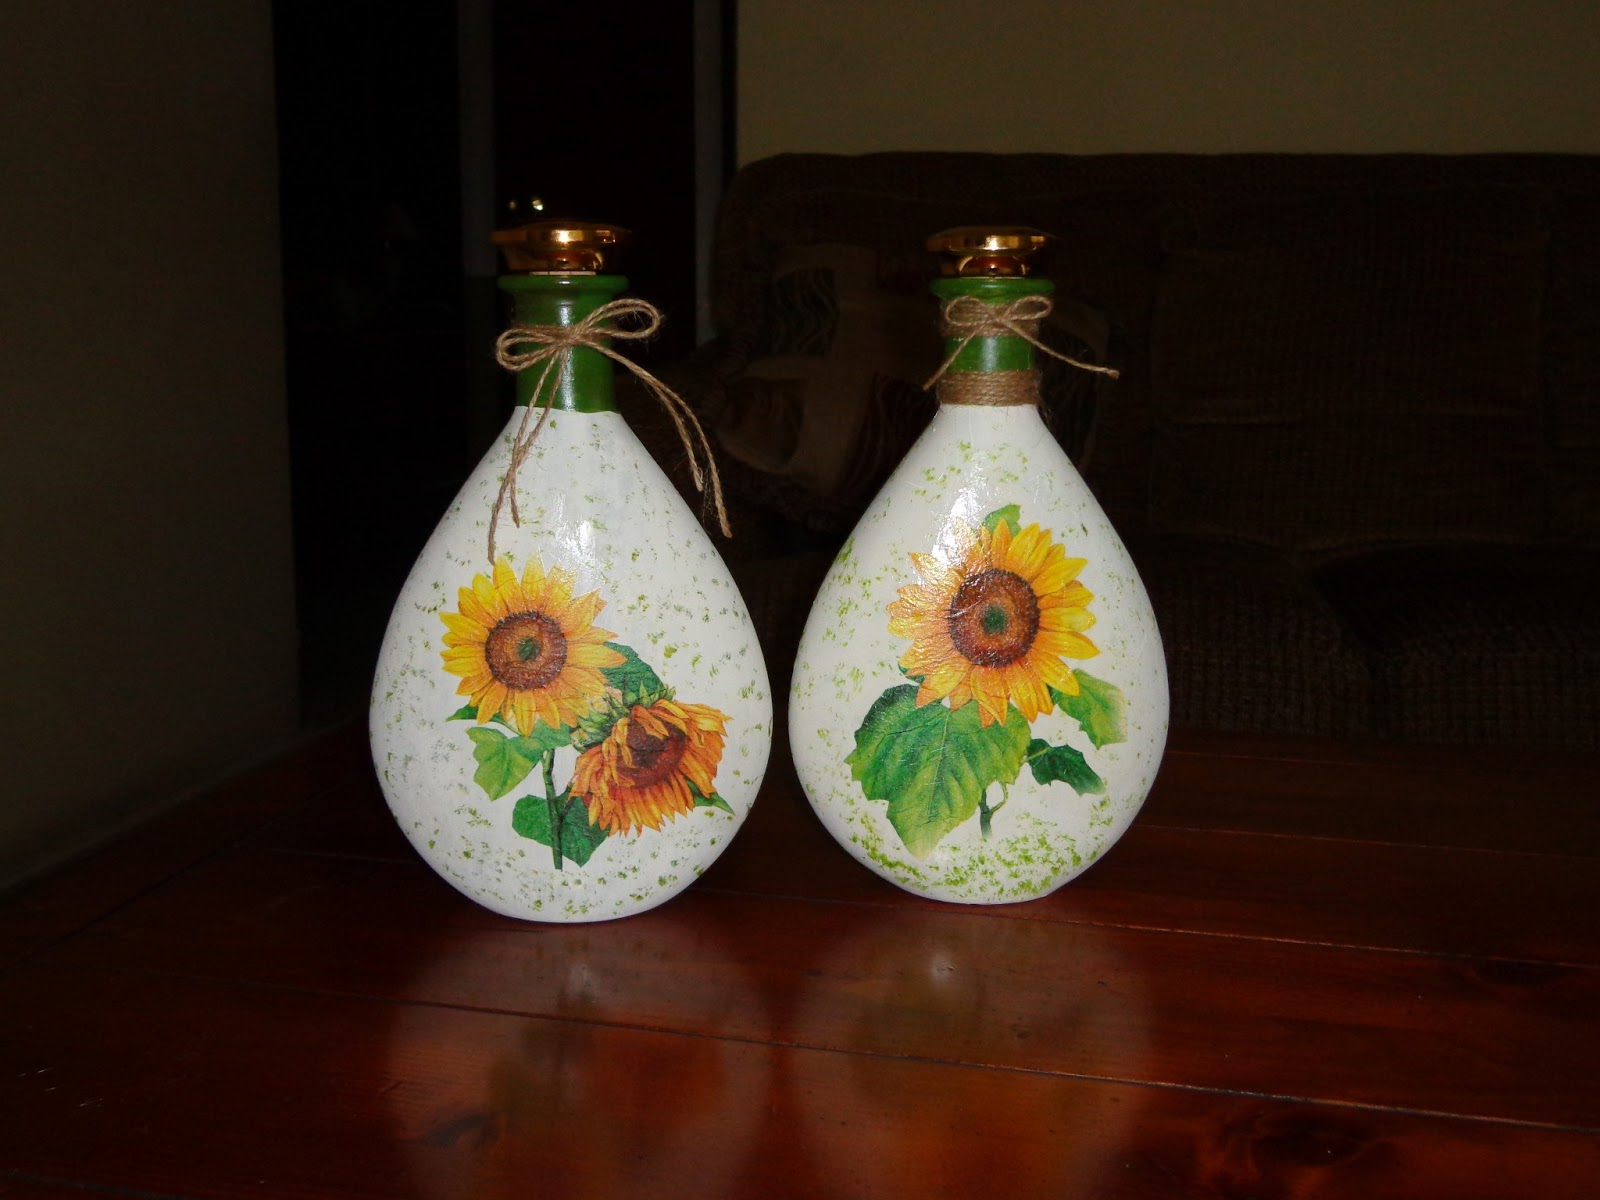 Manualidades con botellas de vidrio imagui for Manualidades con botellas de vidrio